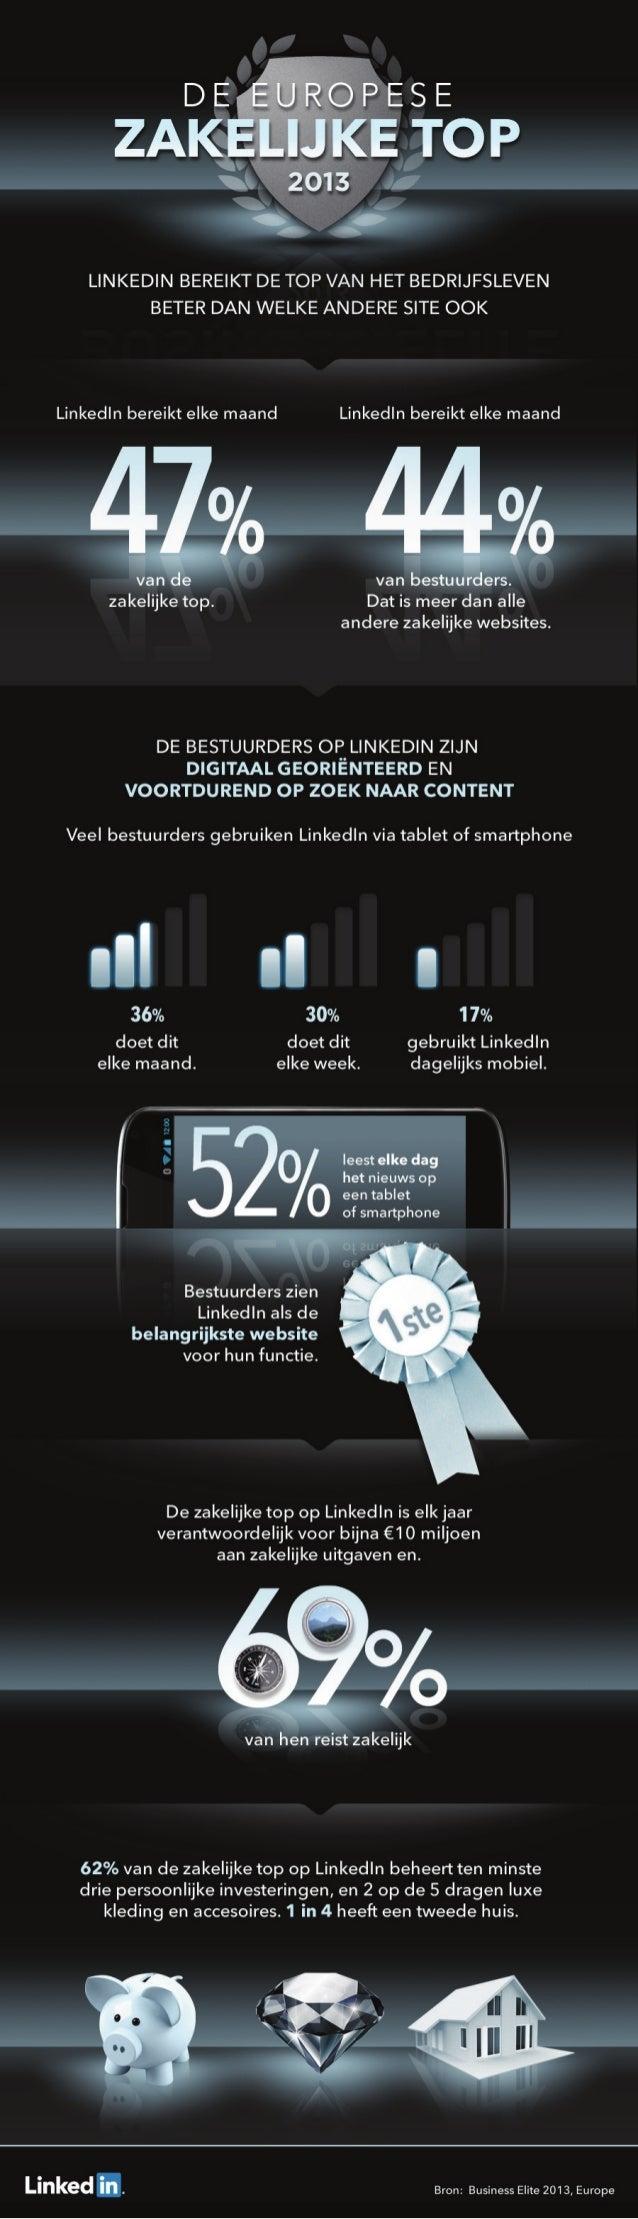 Business Elite Infographic Dutch 2013